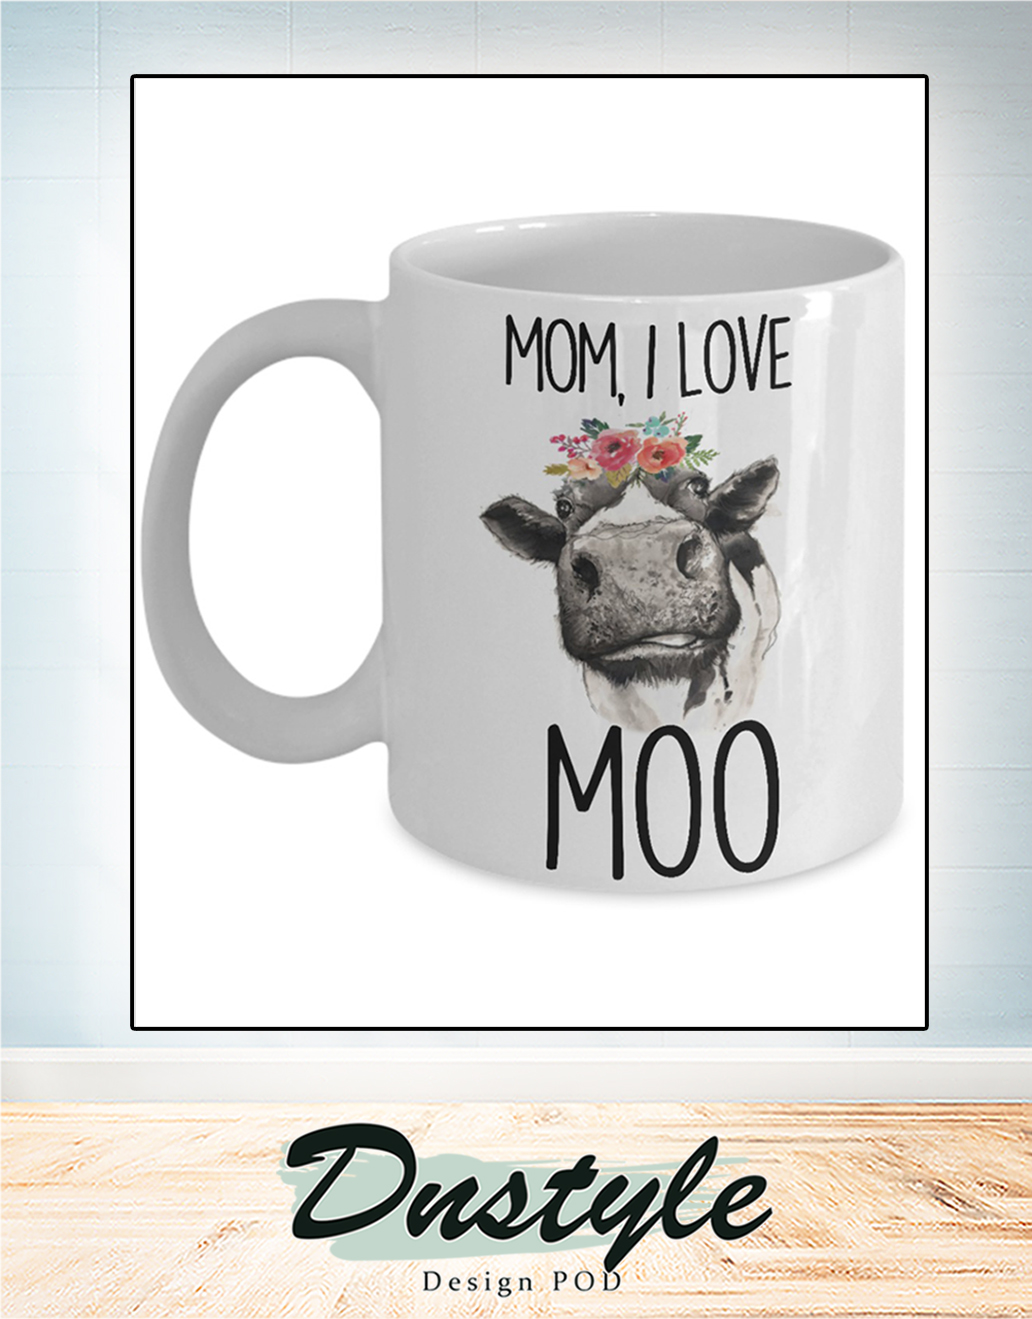 Cow Mom I love moo mug 1